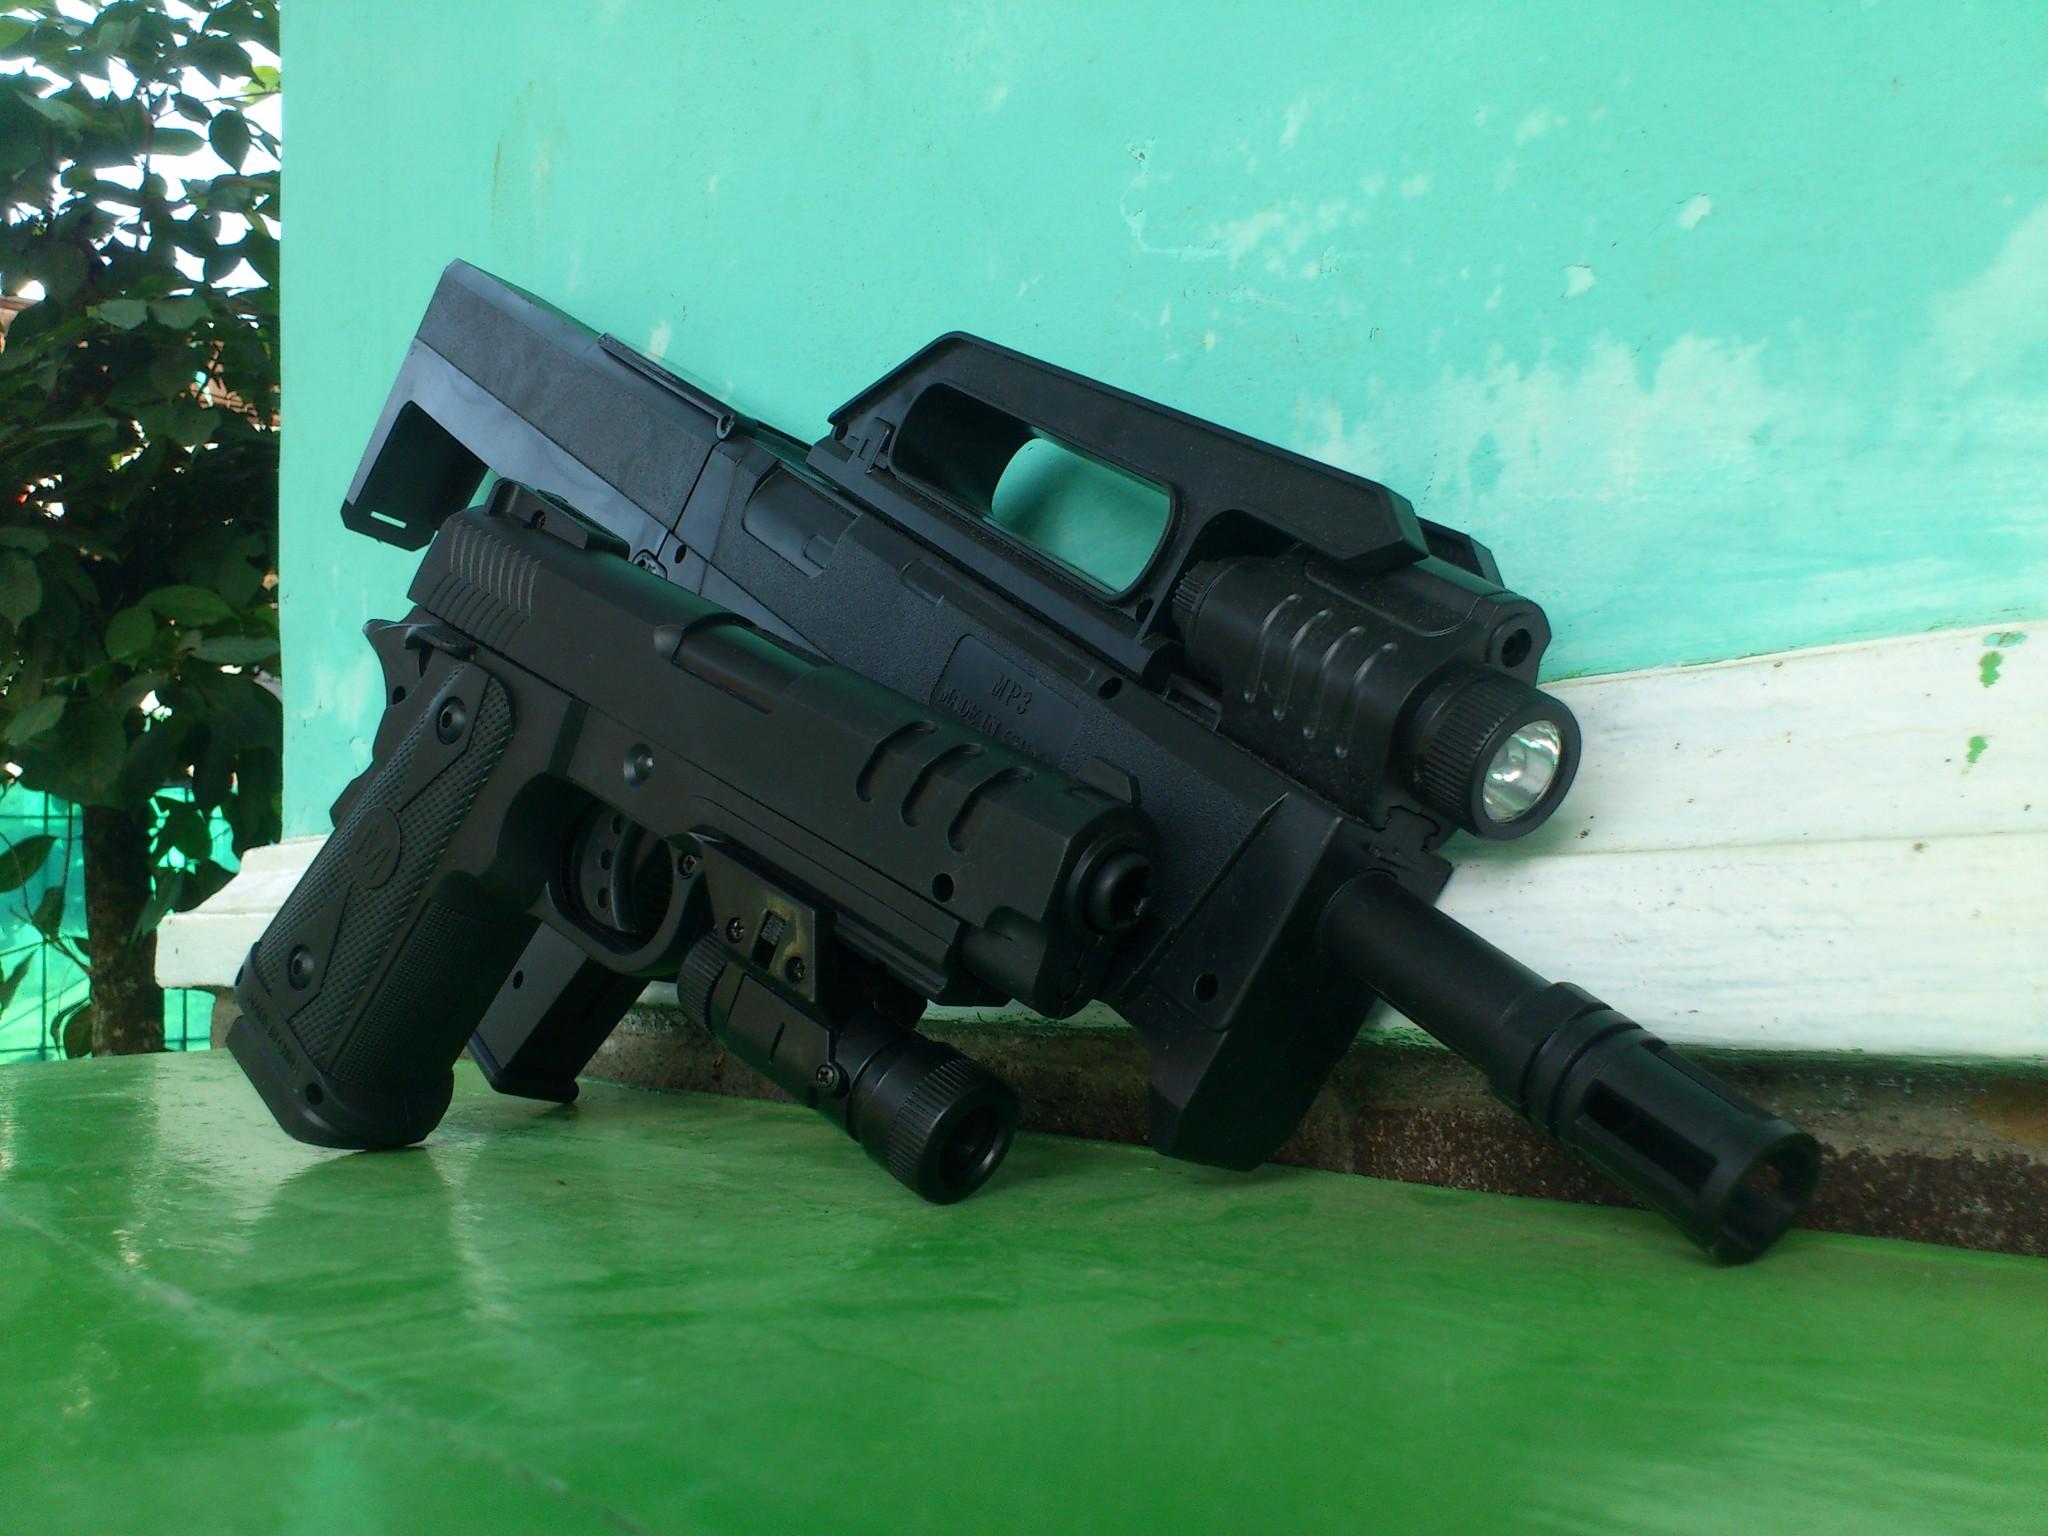 harga Paket FMG9 & Handgun Hi-capa 38 airsoft spring Tokopedia.com